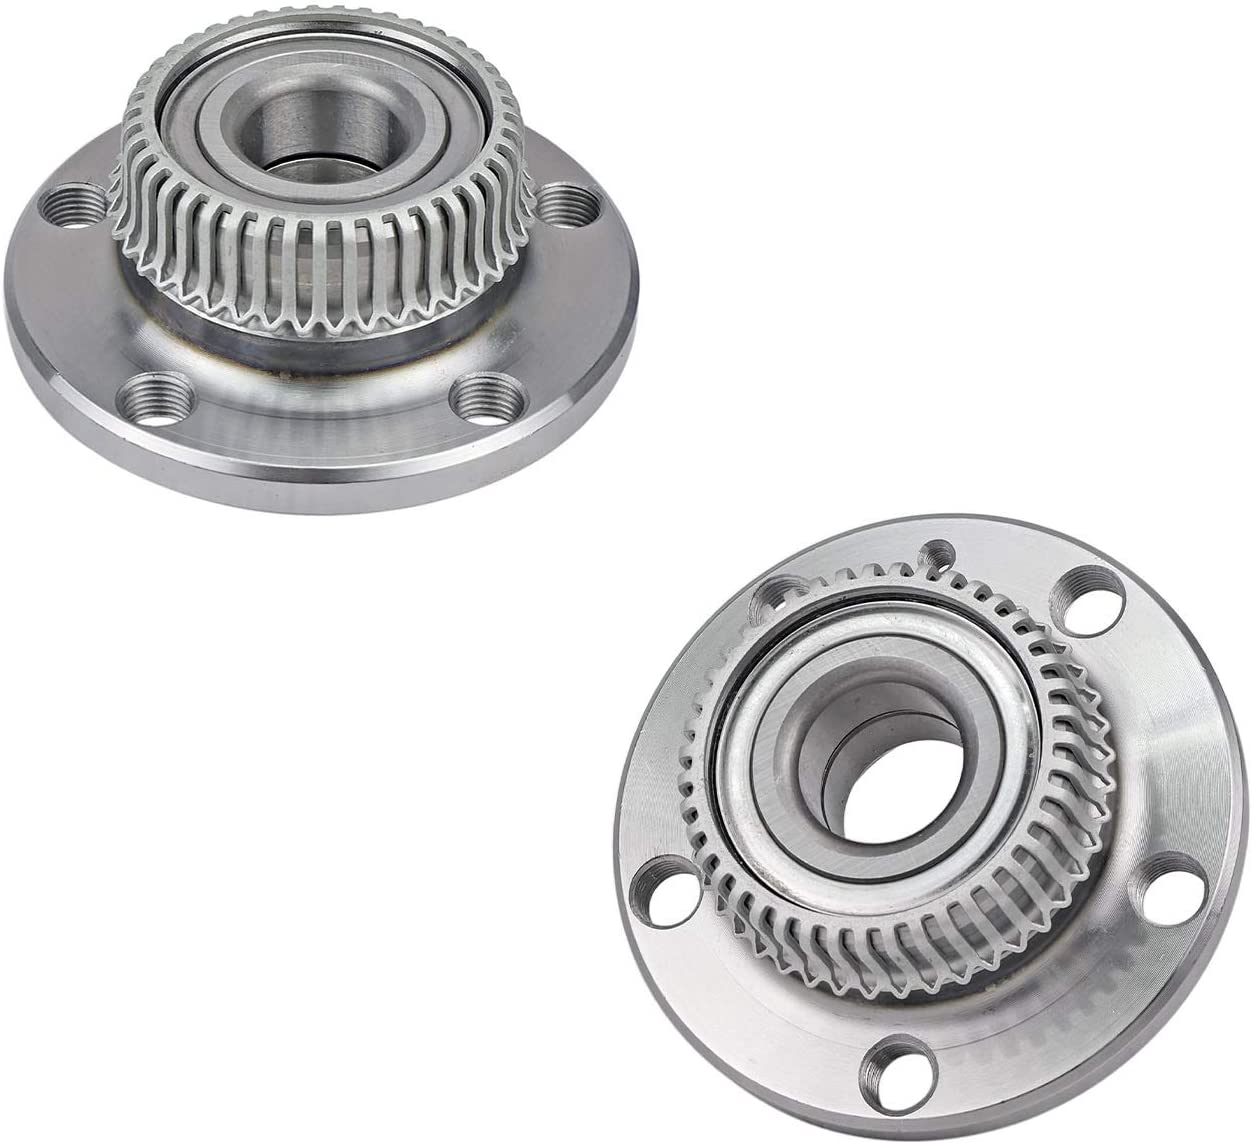 VW Jetta front wheel bearings *pair* 1999-2005